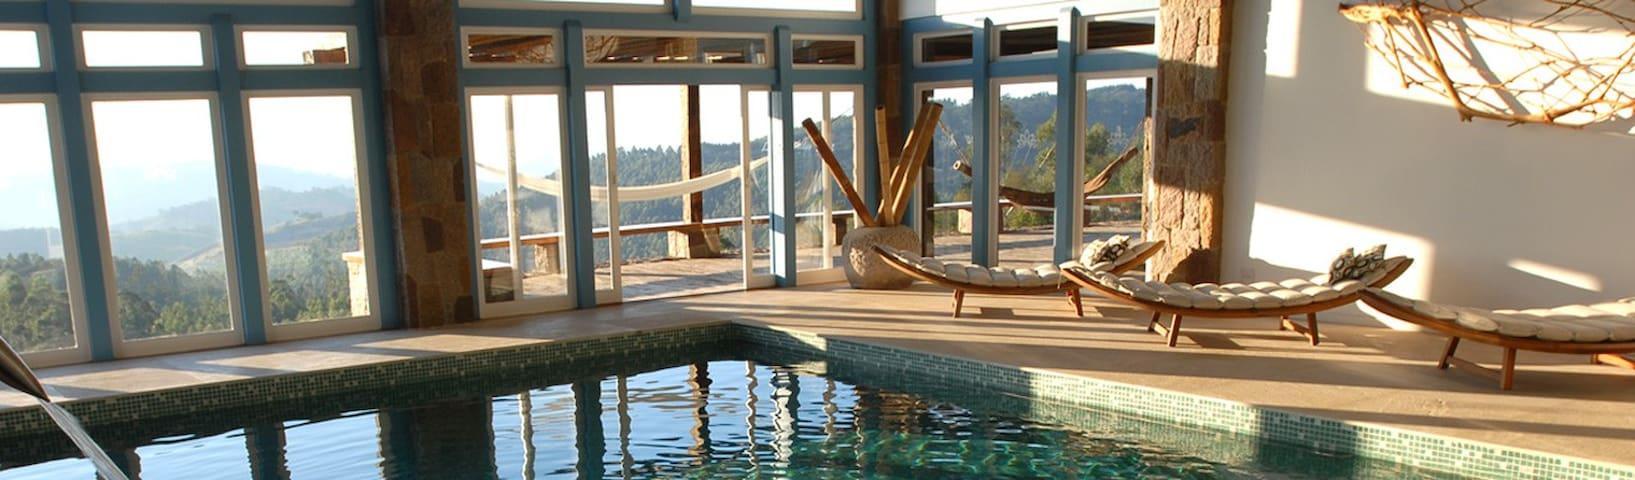 Lake Vilas Charm Hotel - Amparo - キャビン